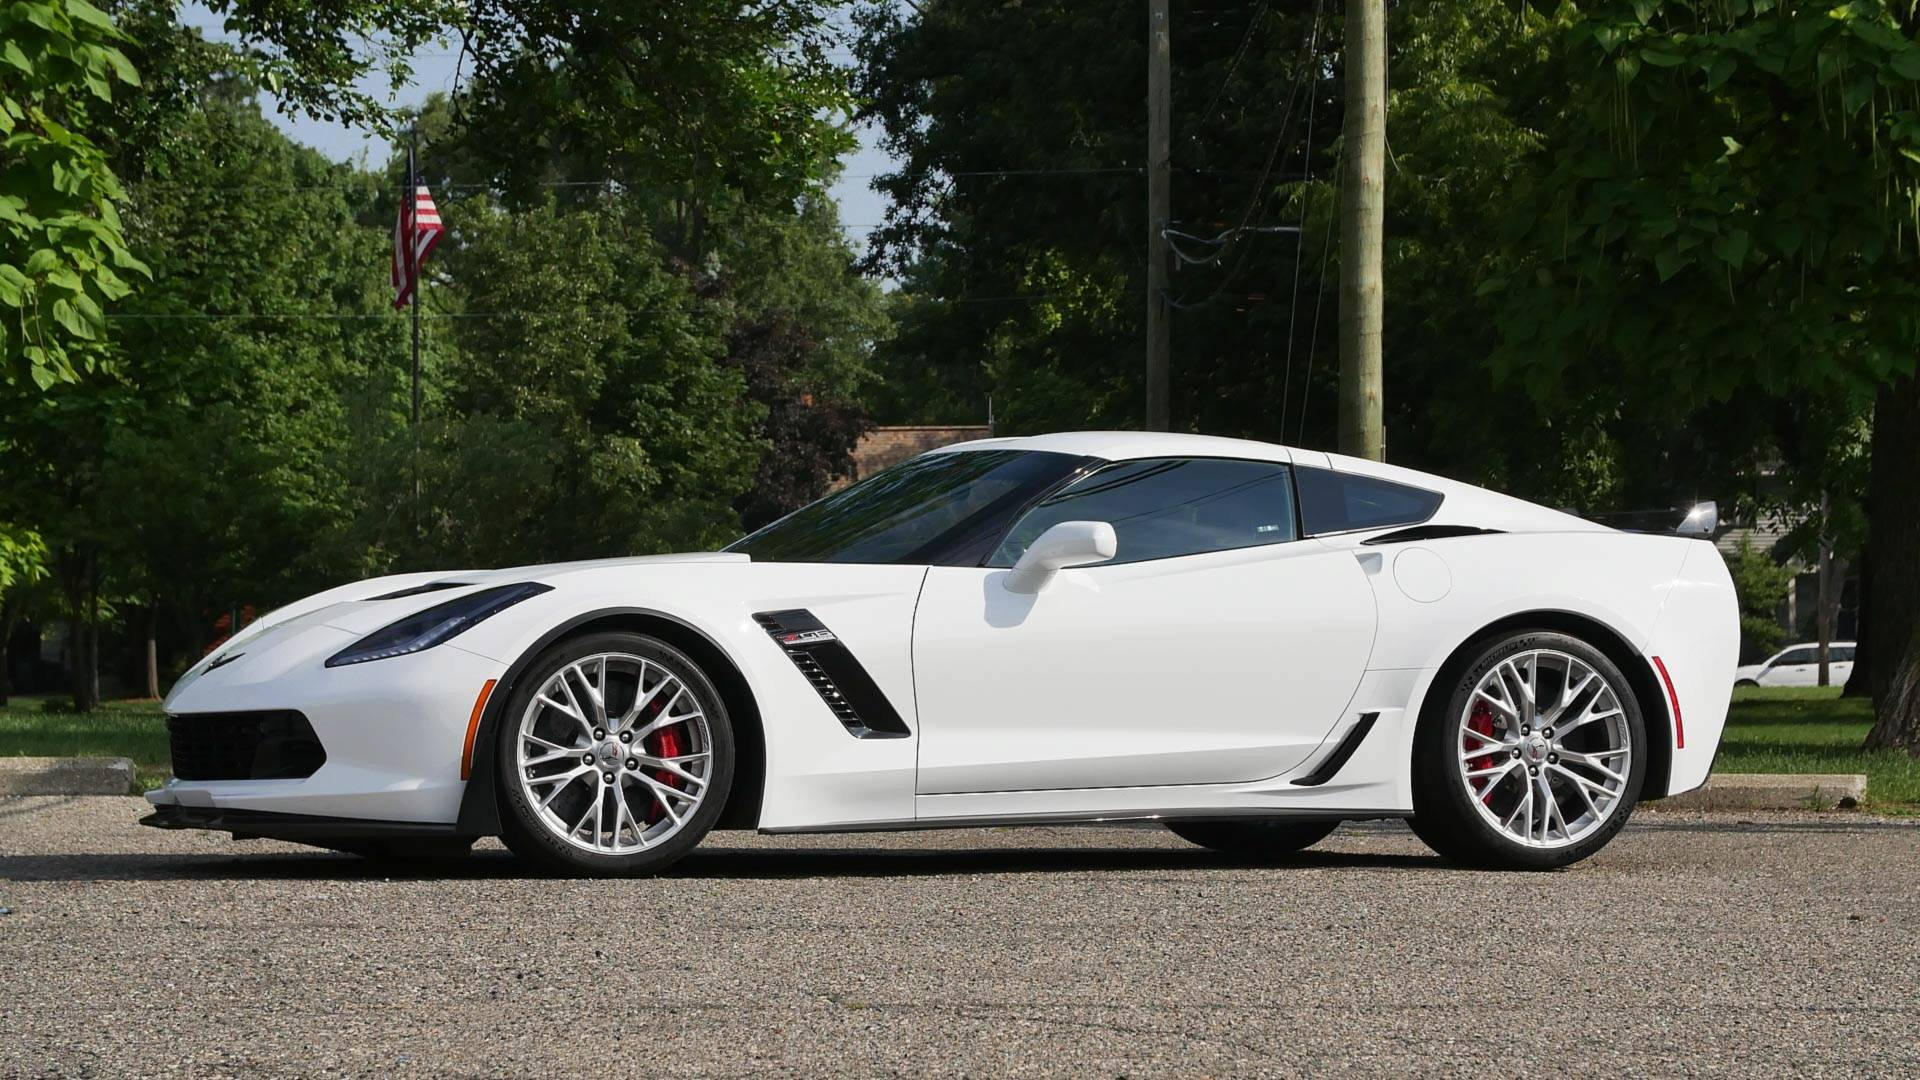 Kelebihan Kekurangan Chevrolet Corvette 2019 Review